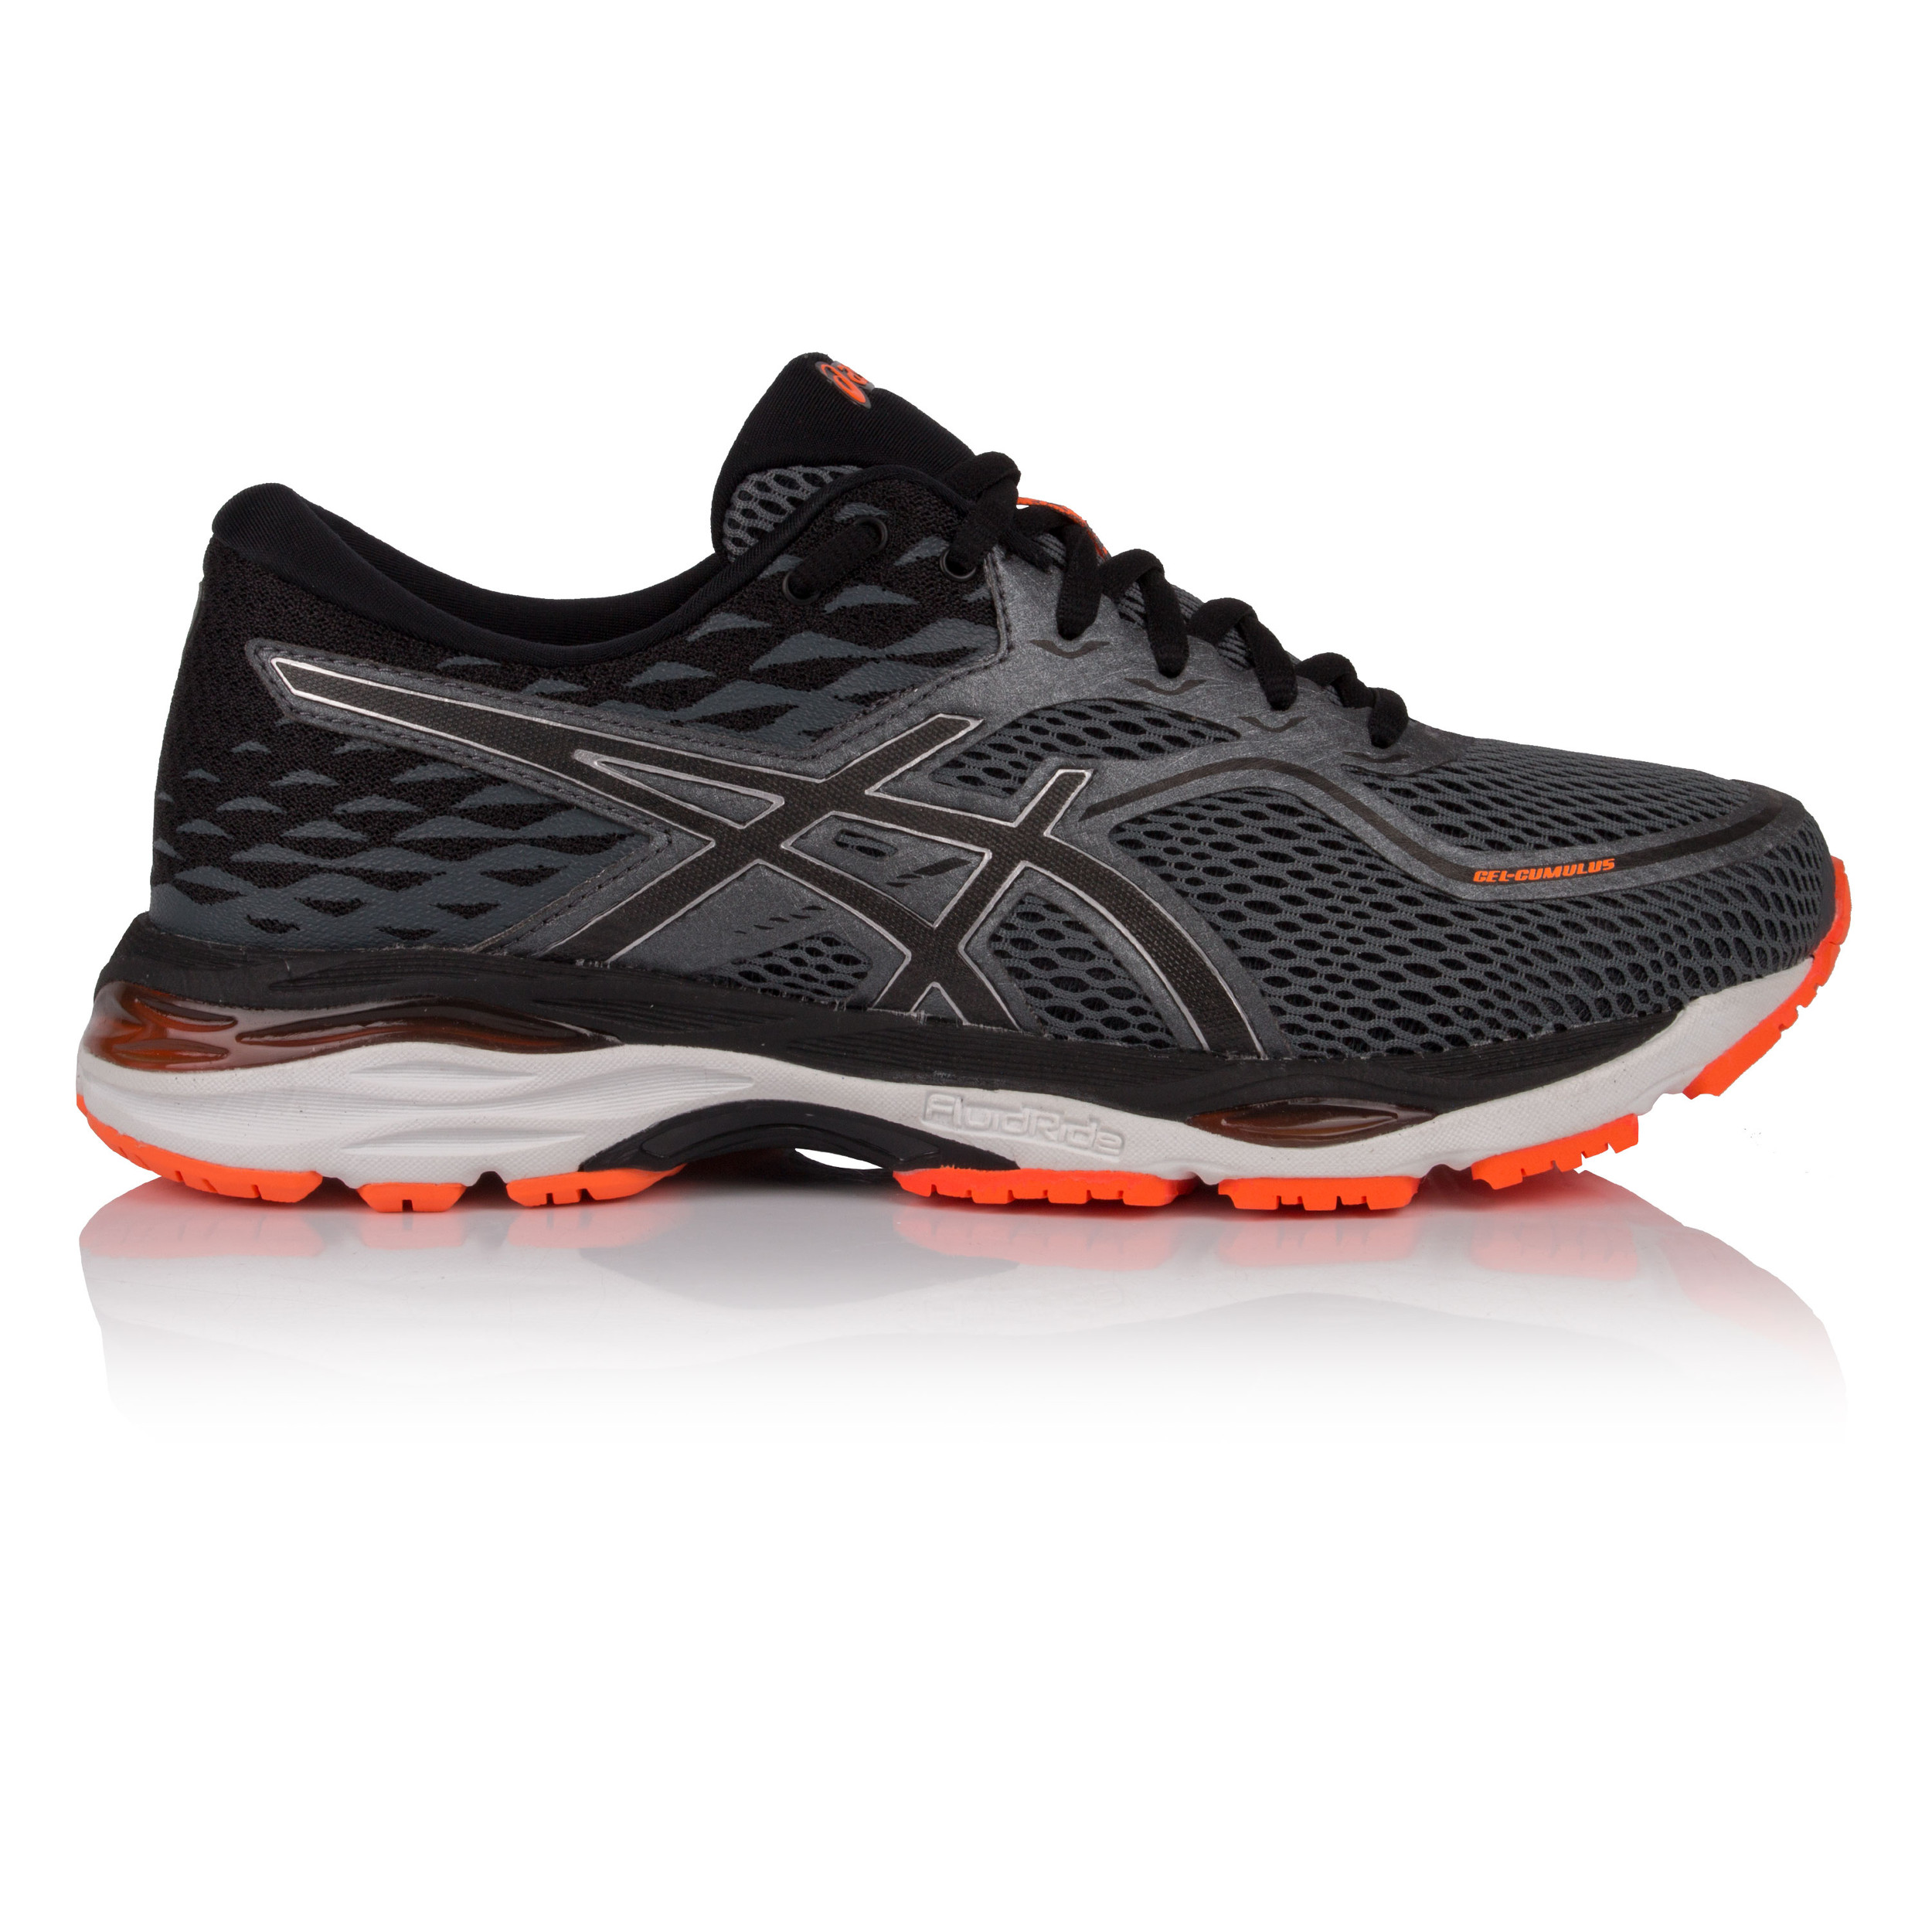 73687c1cd Asics Gel-Cumulus 19 Mens Grey Cushioned Running Road Sports Shoes Trainers